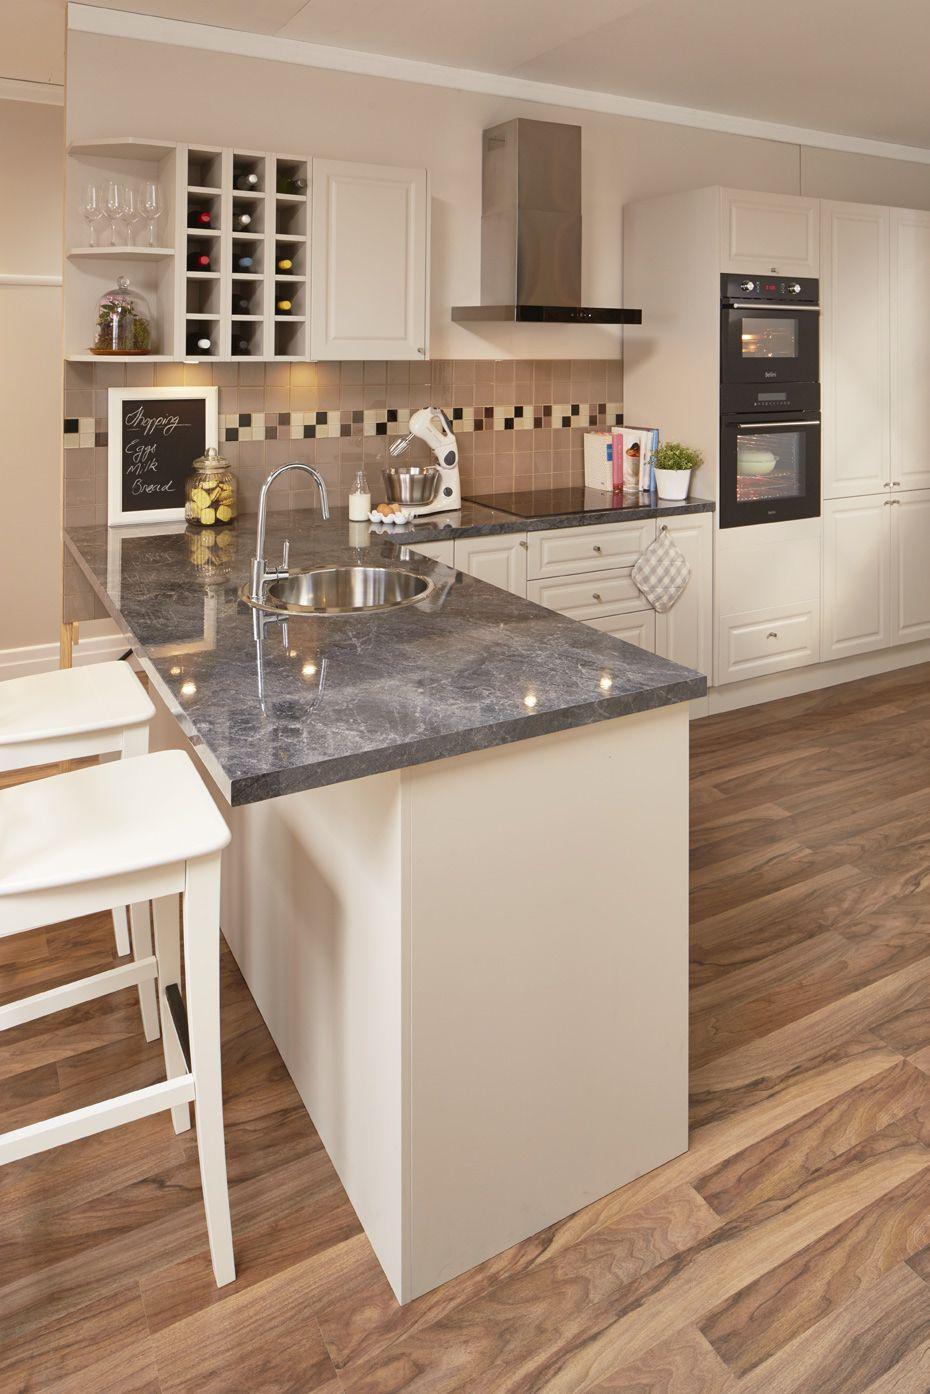 kaboodle 2400 x 600 x 38mm black granite benchtop stone benchtop kitchen kitchen design on kaboodle kitchen enoki id=12433